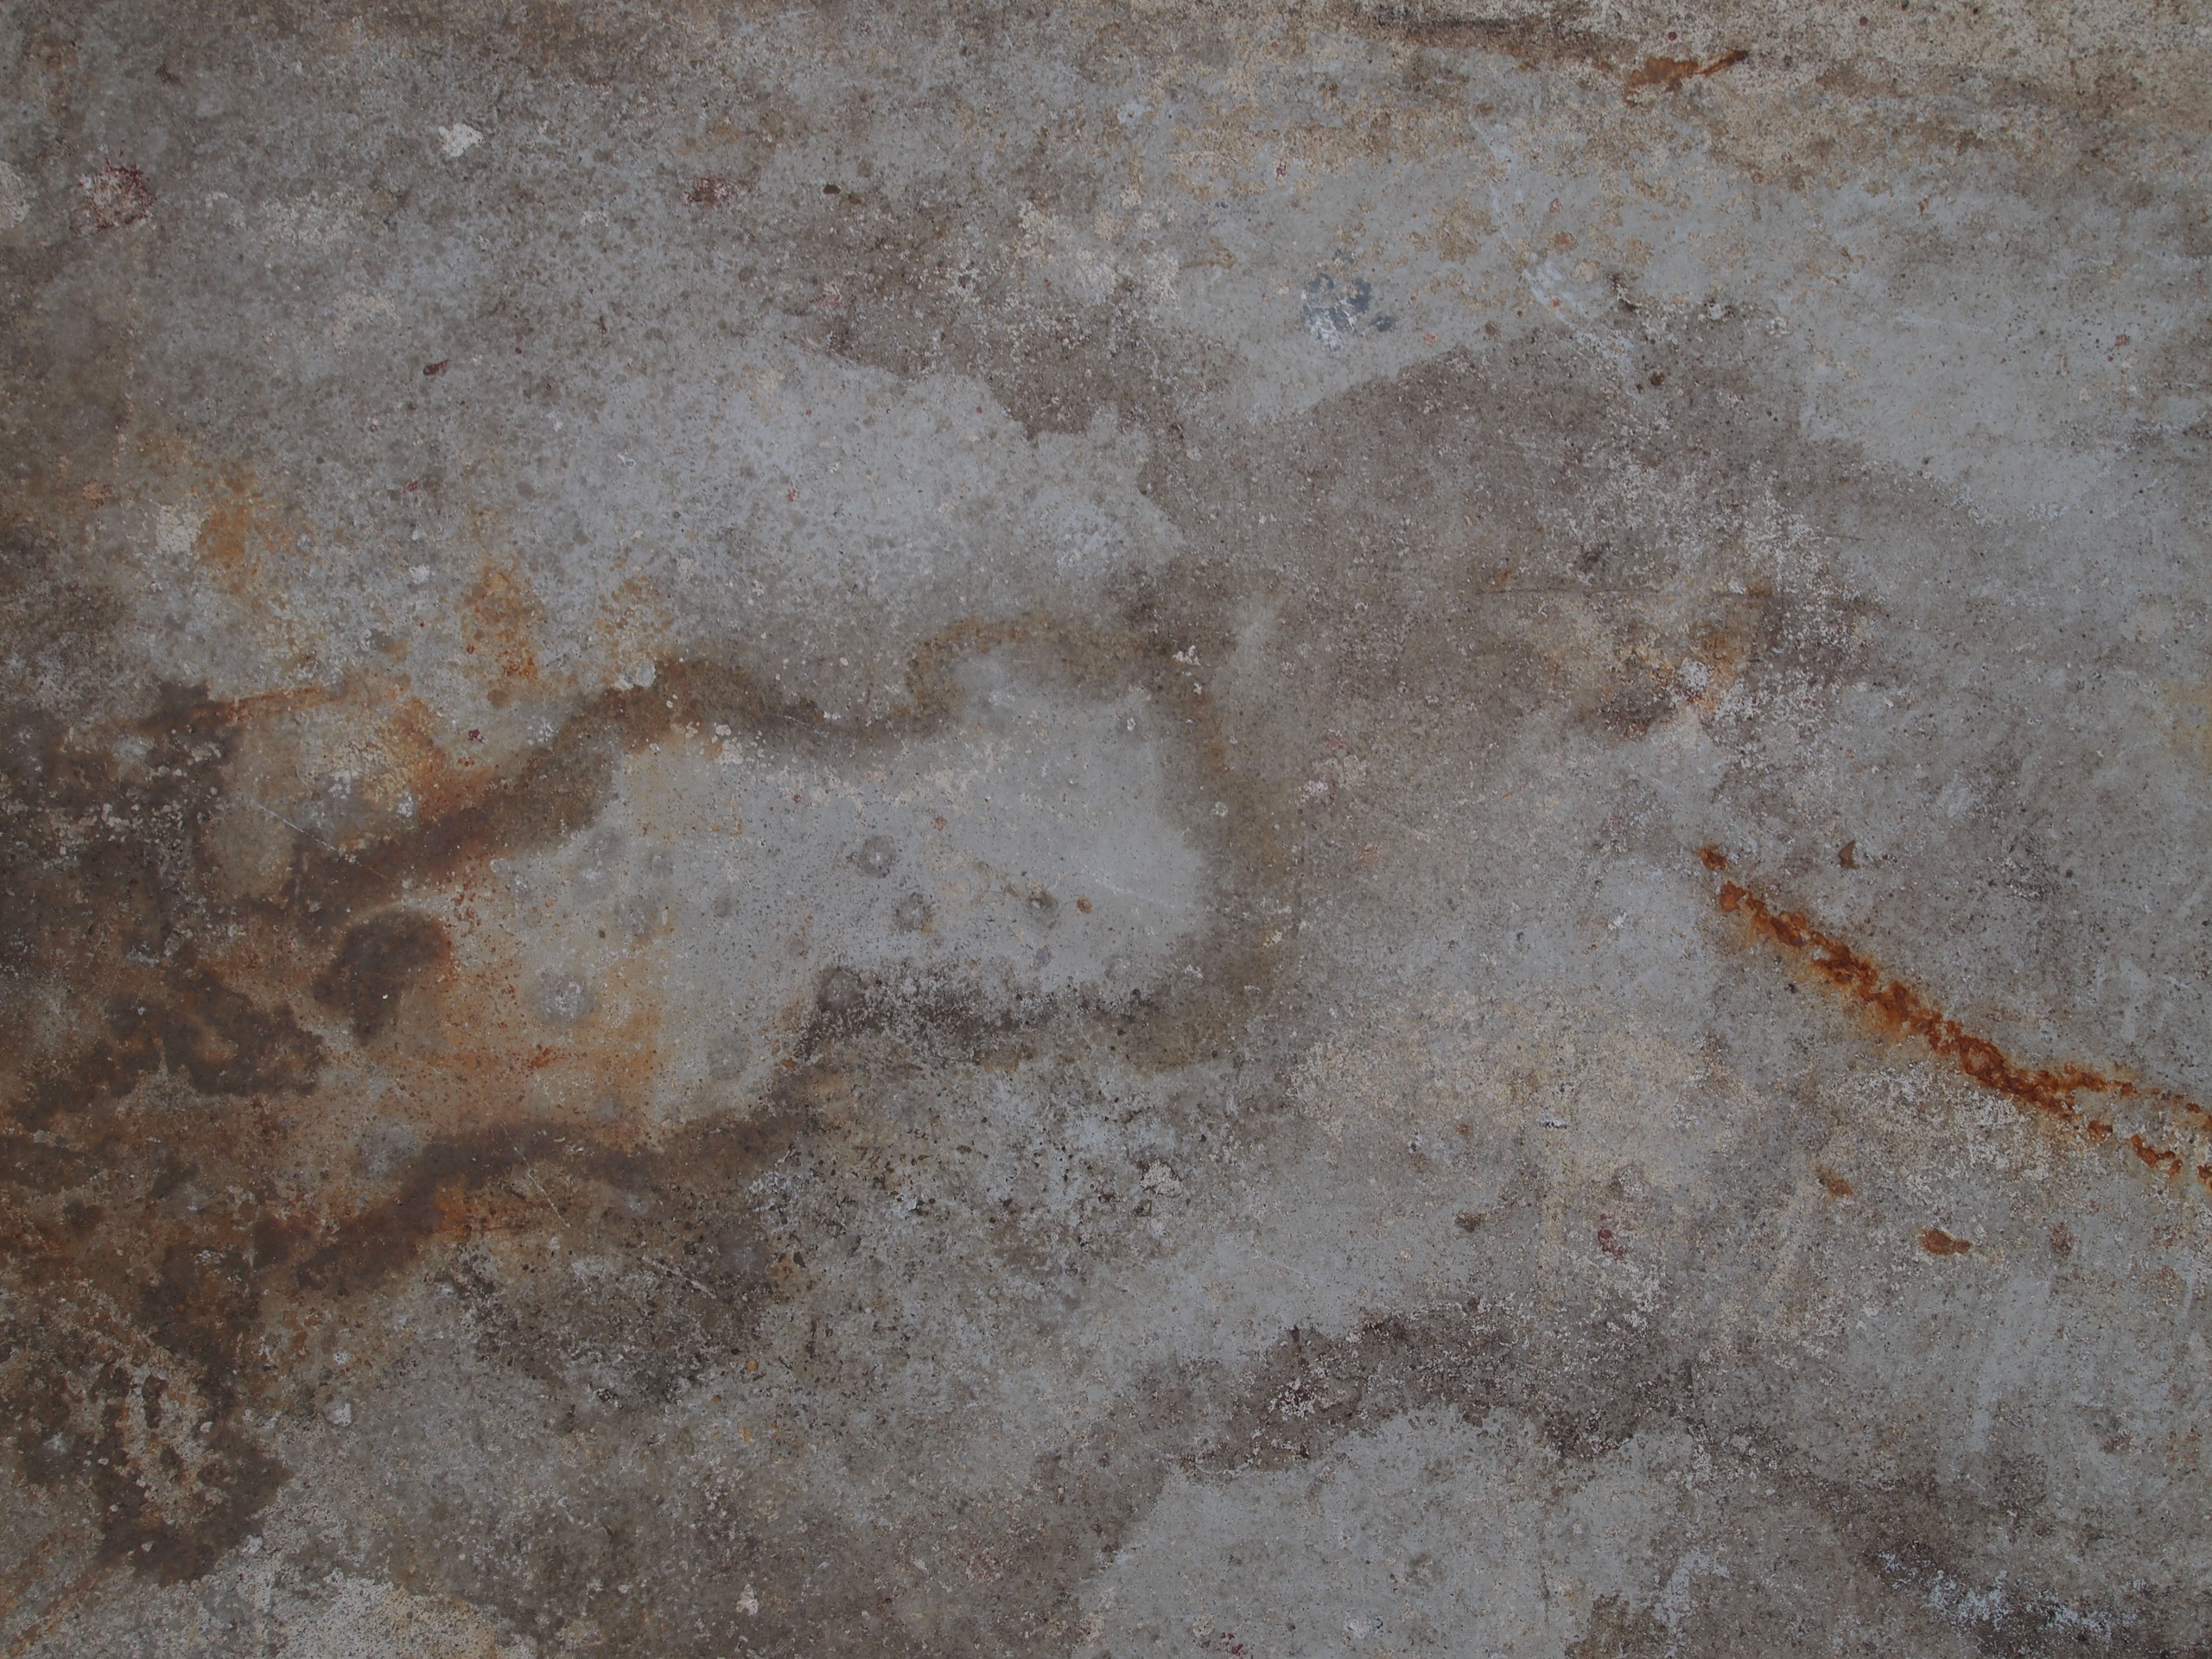 Rust on Concrete 5 by RosalineStock on DeviantArt